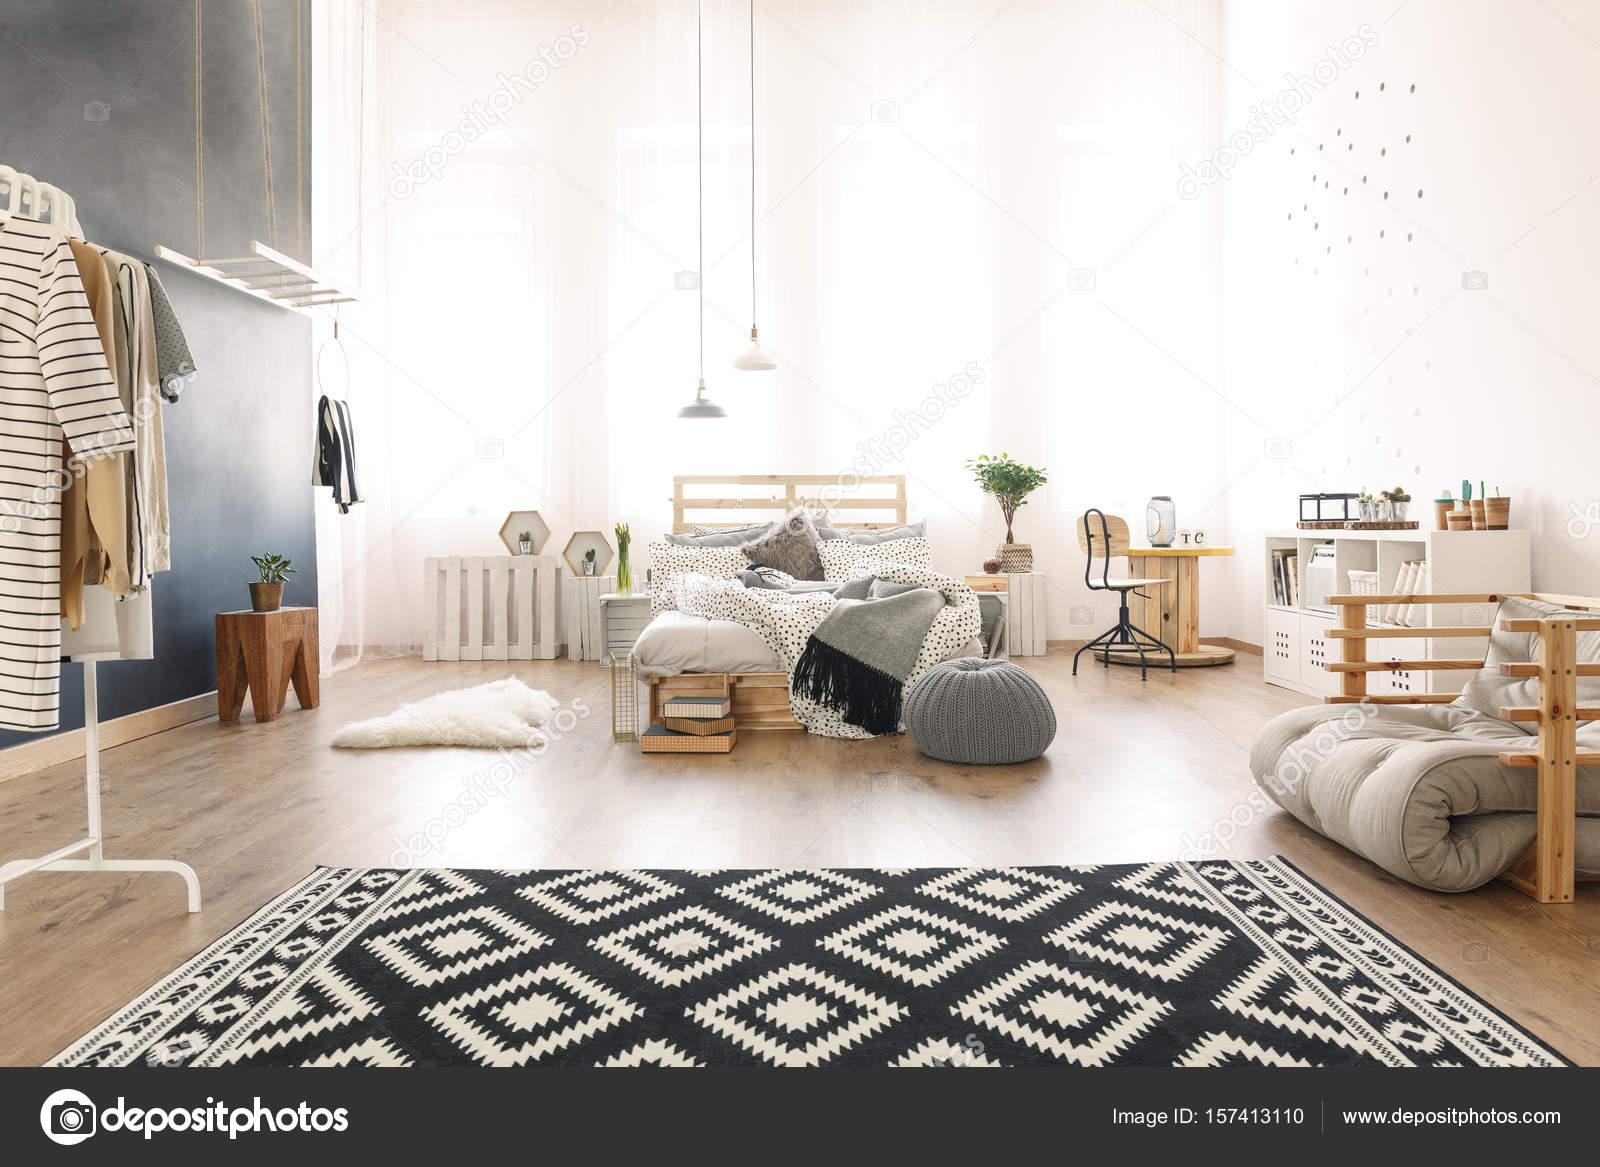 Zwart Wit Appartement : Zwart wit appartement u2014 stockfoto © photographee.eu #157413110